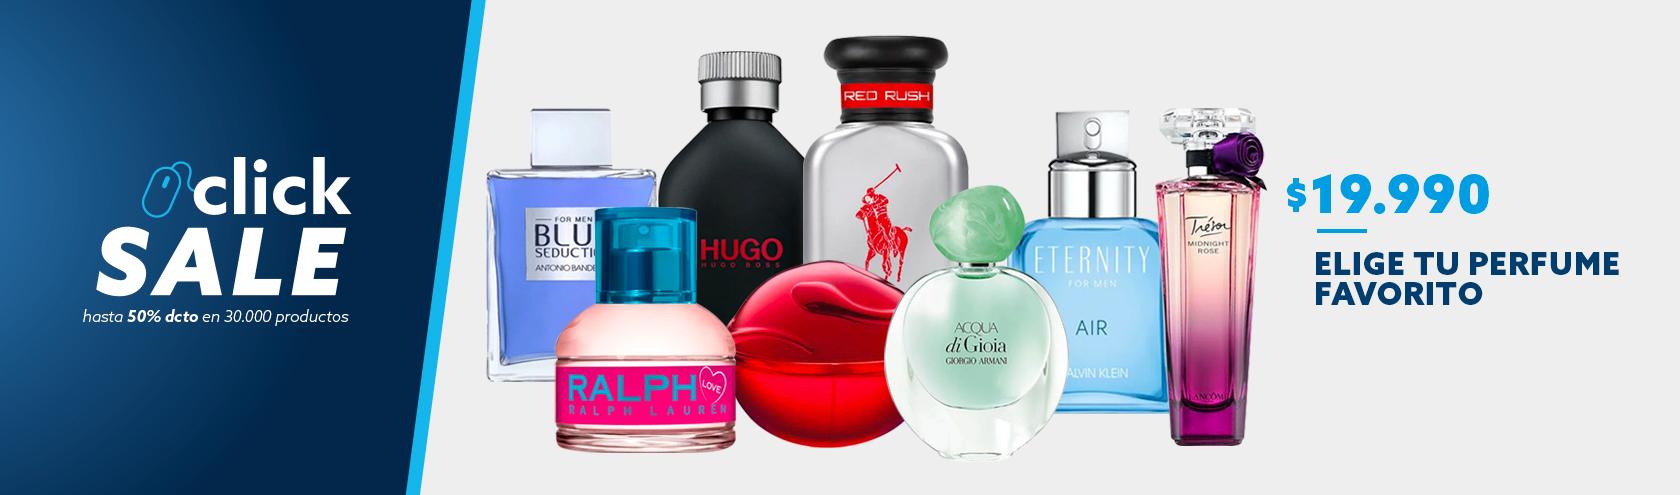 Elige Tu Perfumes Favoritos a 19990